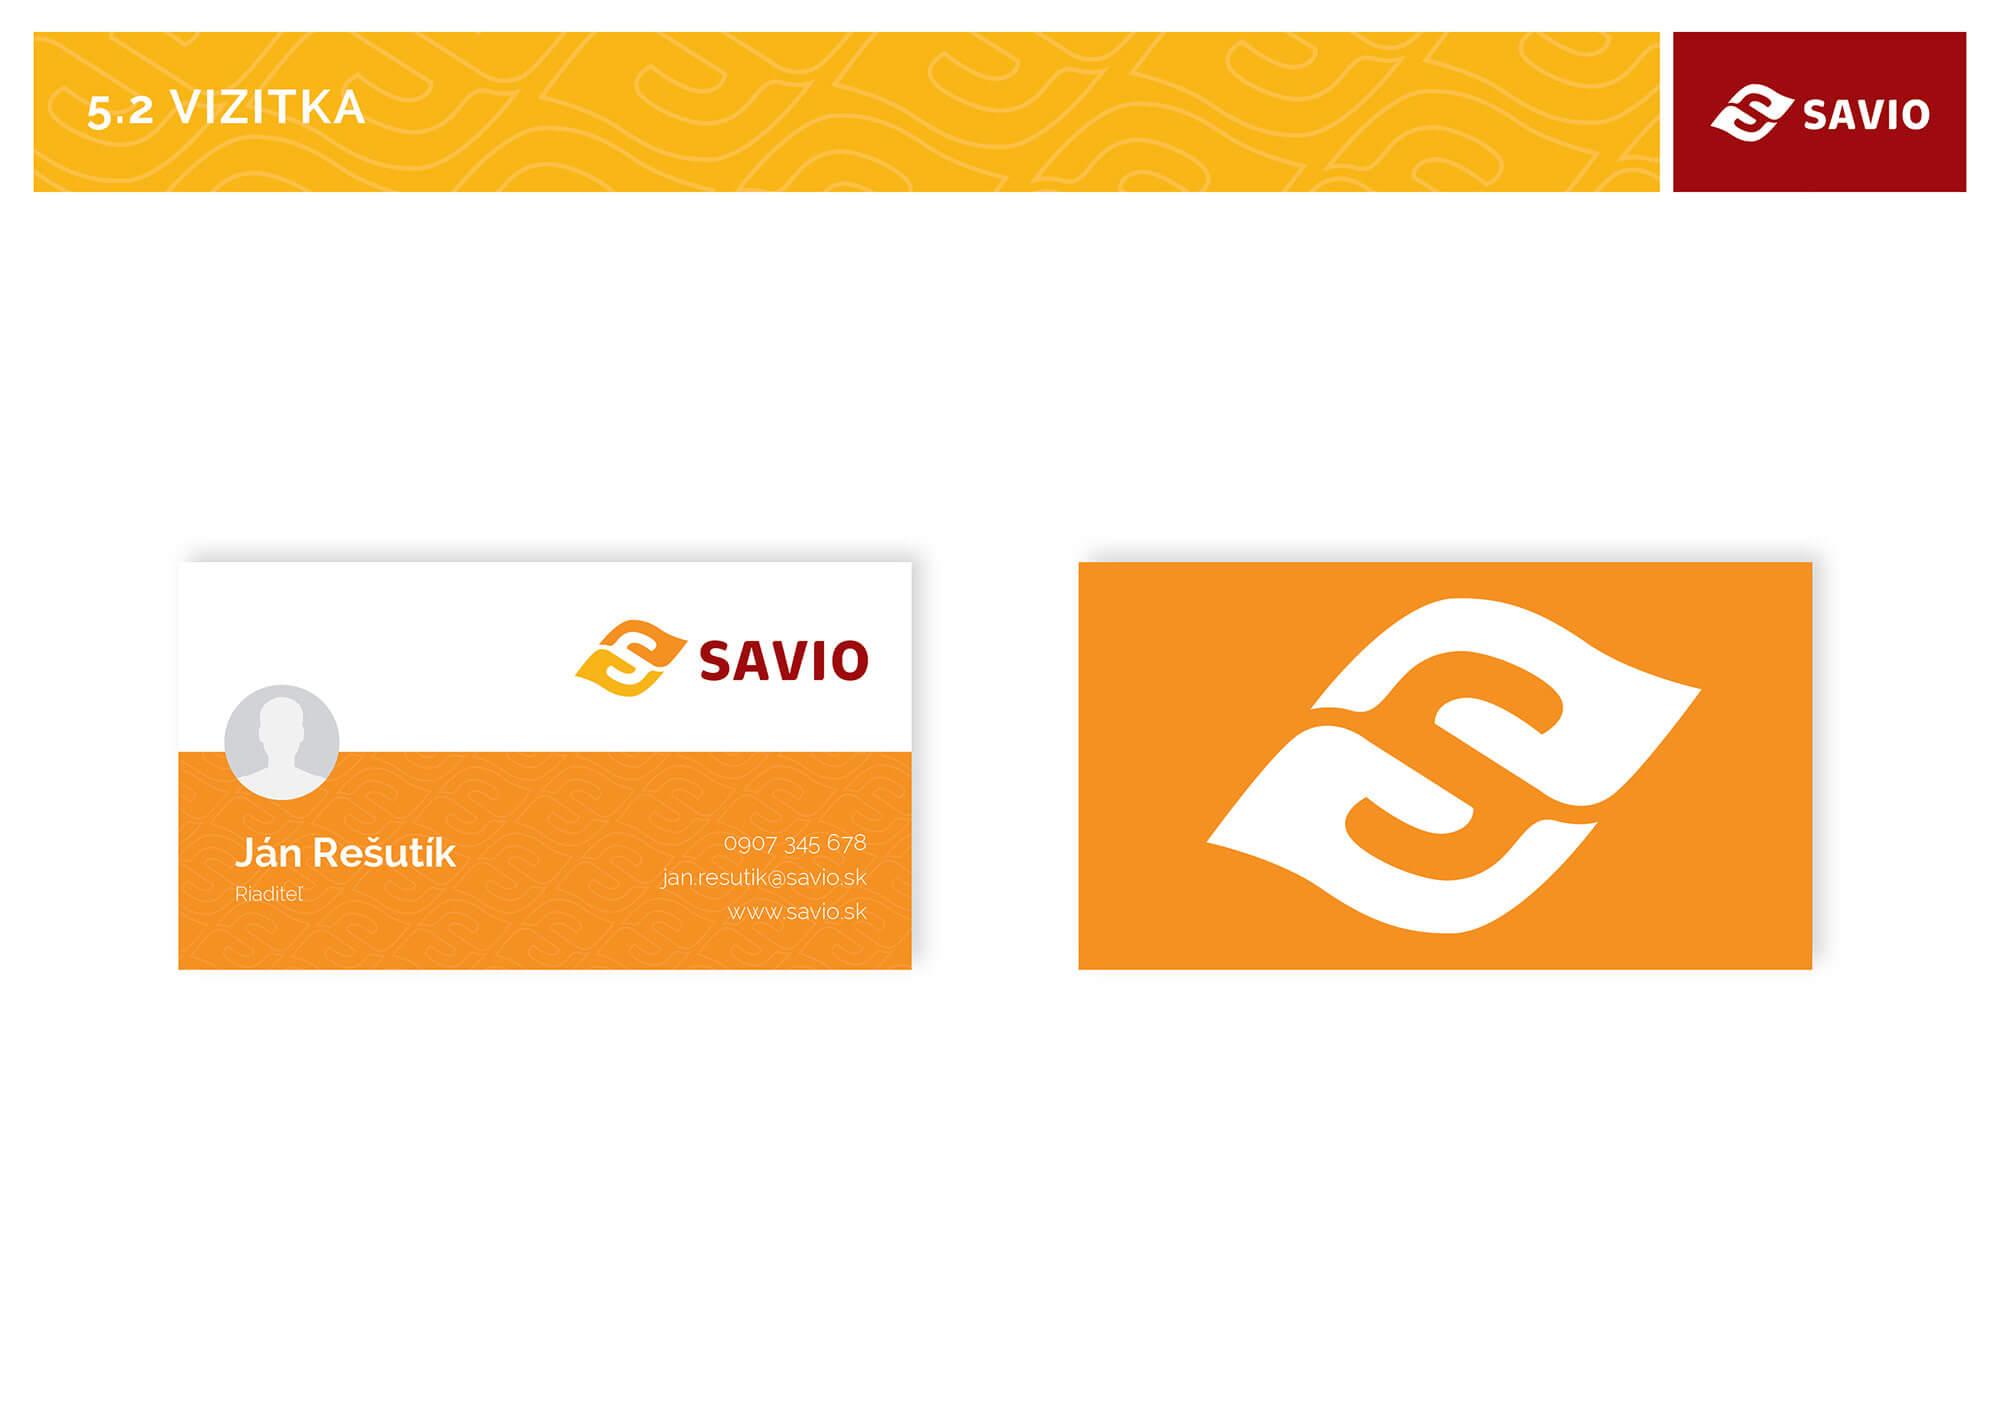 SAV-04-Strategia-CI-web-design-manual-v0213